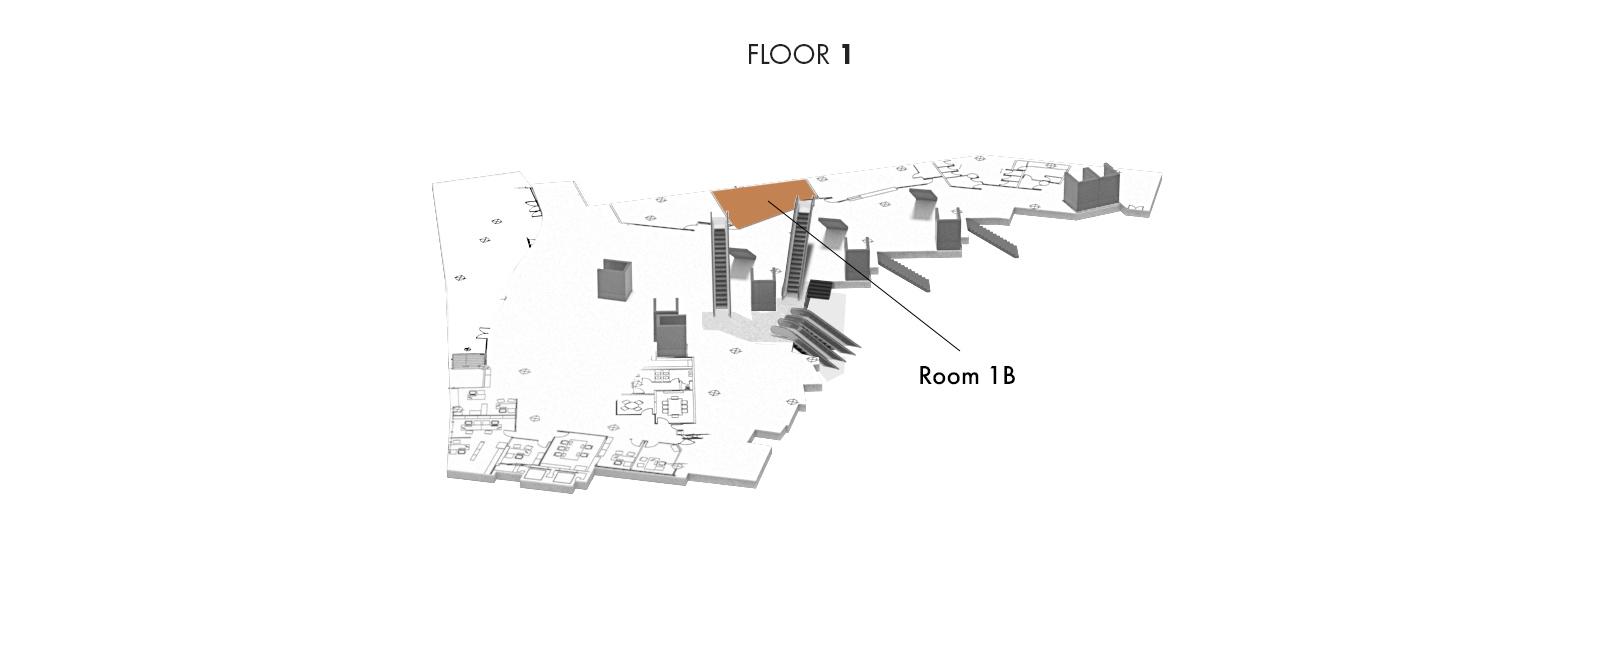 Room 1B, Floor 1 | Palacio Euskalduna Jauregia